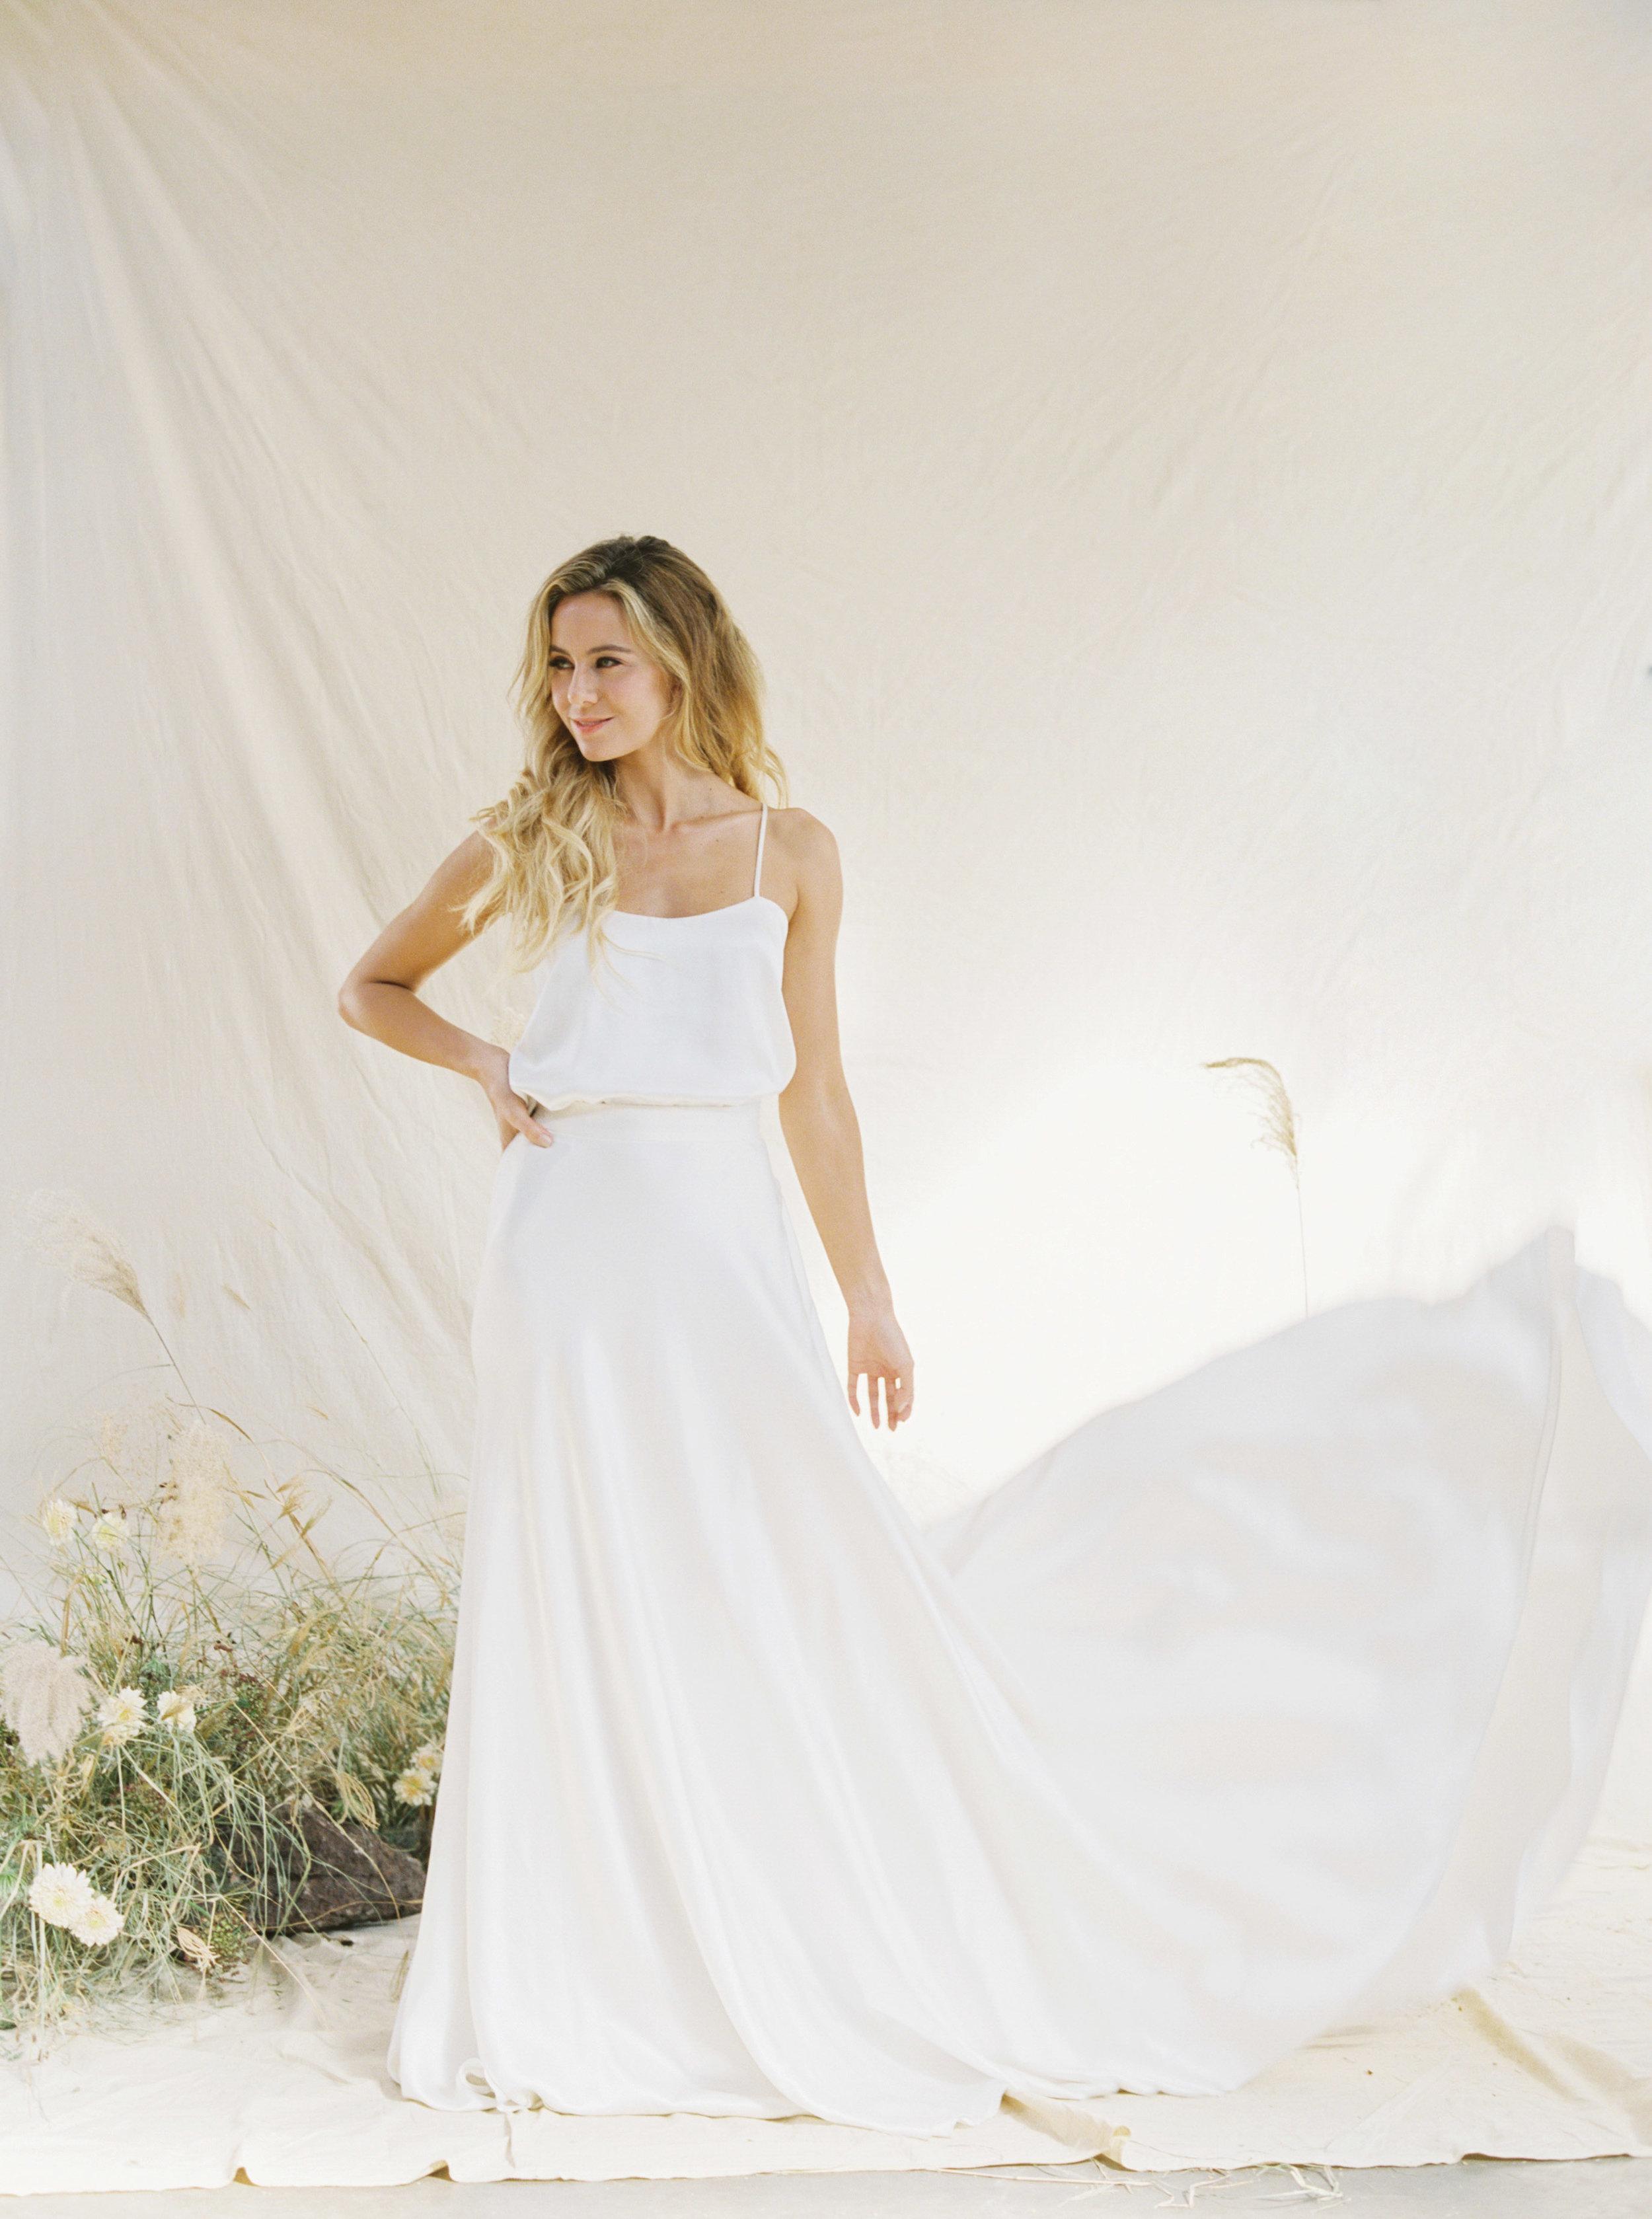 Artisan dried bridal flower arrangements for a Sydney wedding photoshoot with bride wearing sleek wedding gown